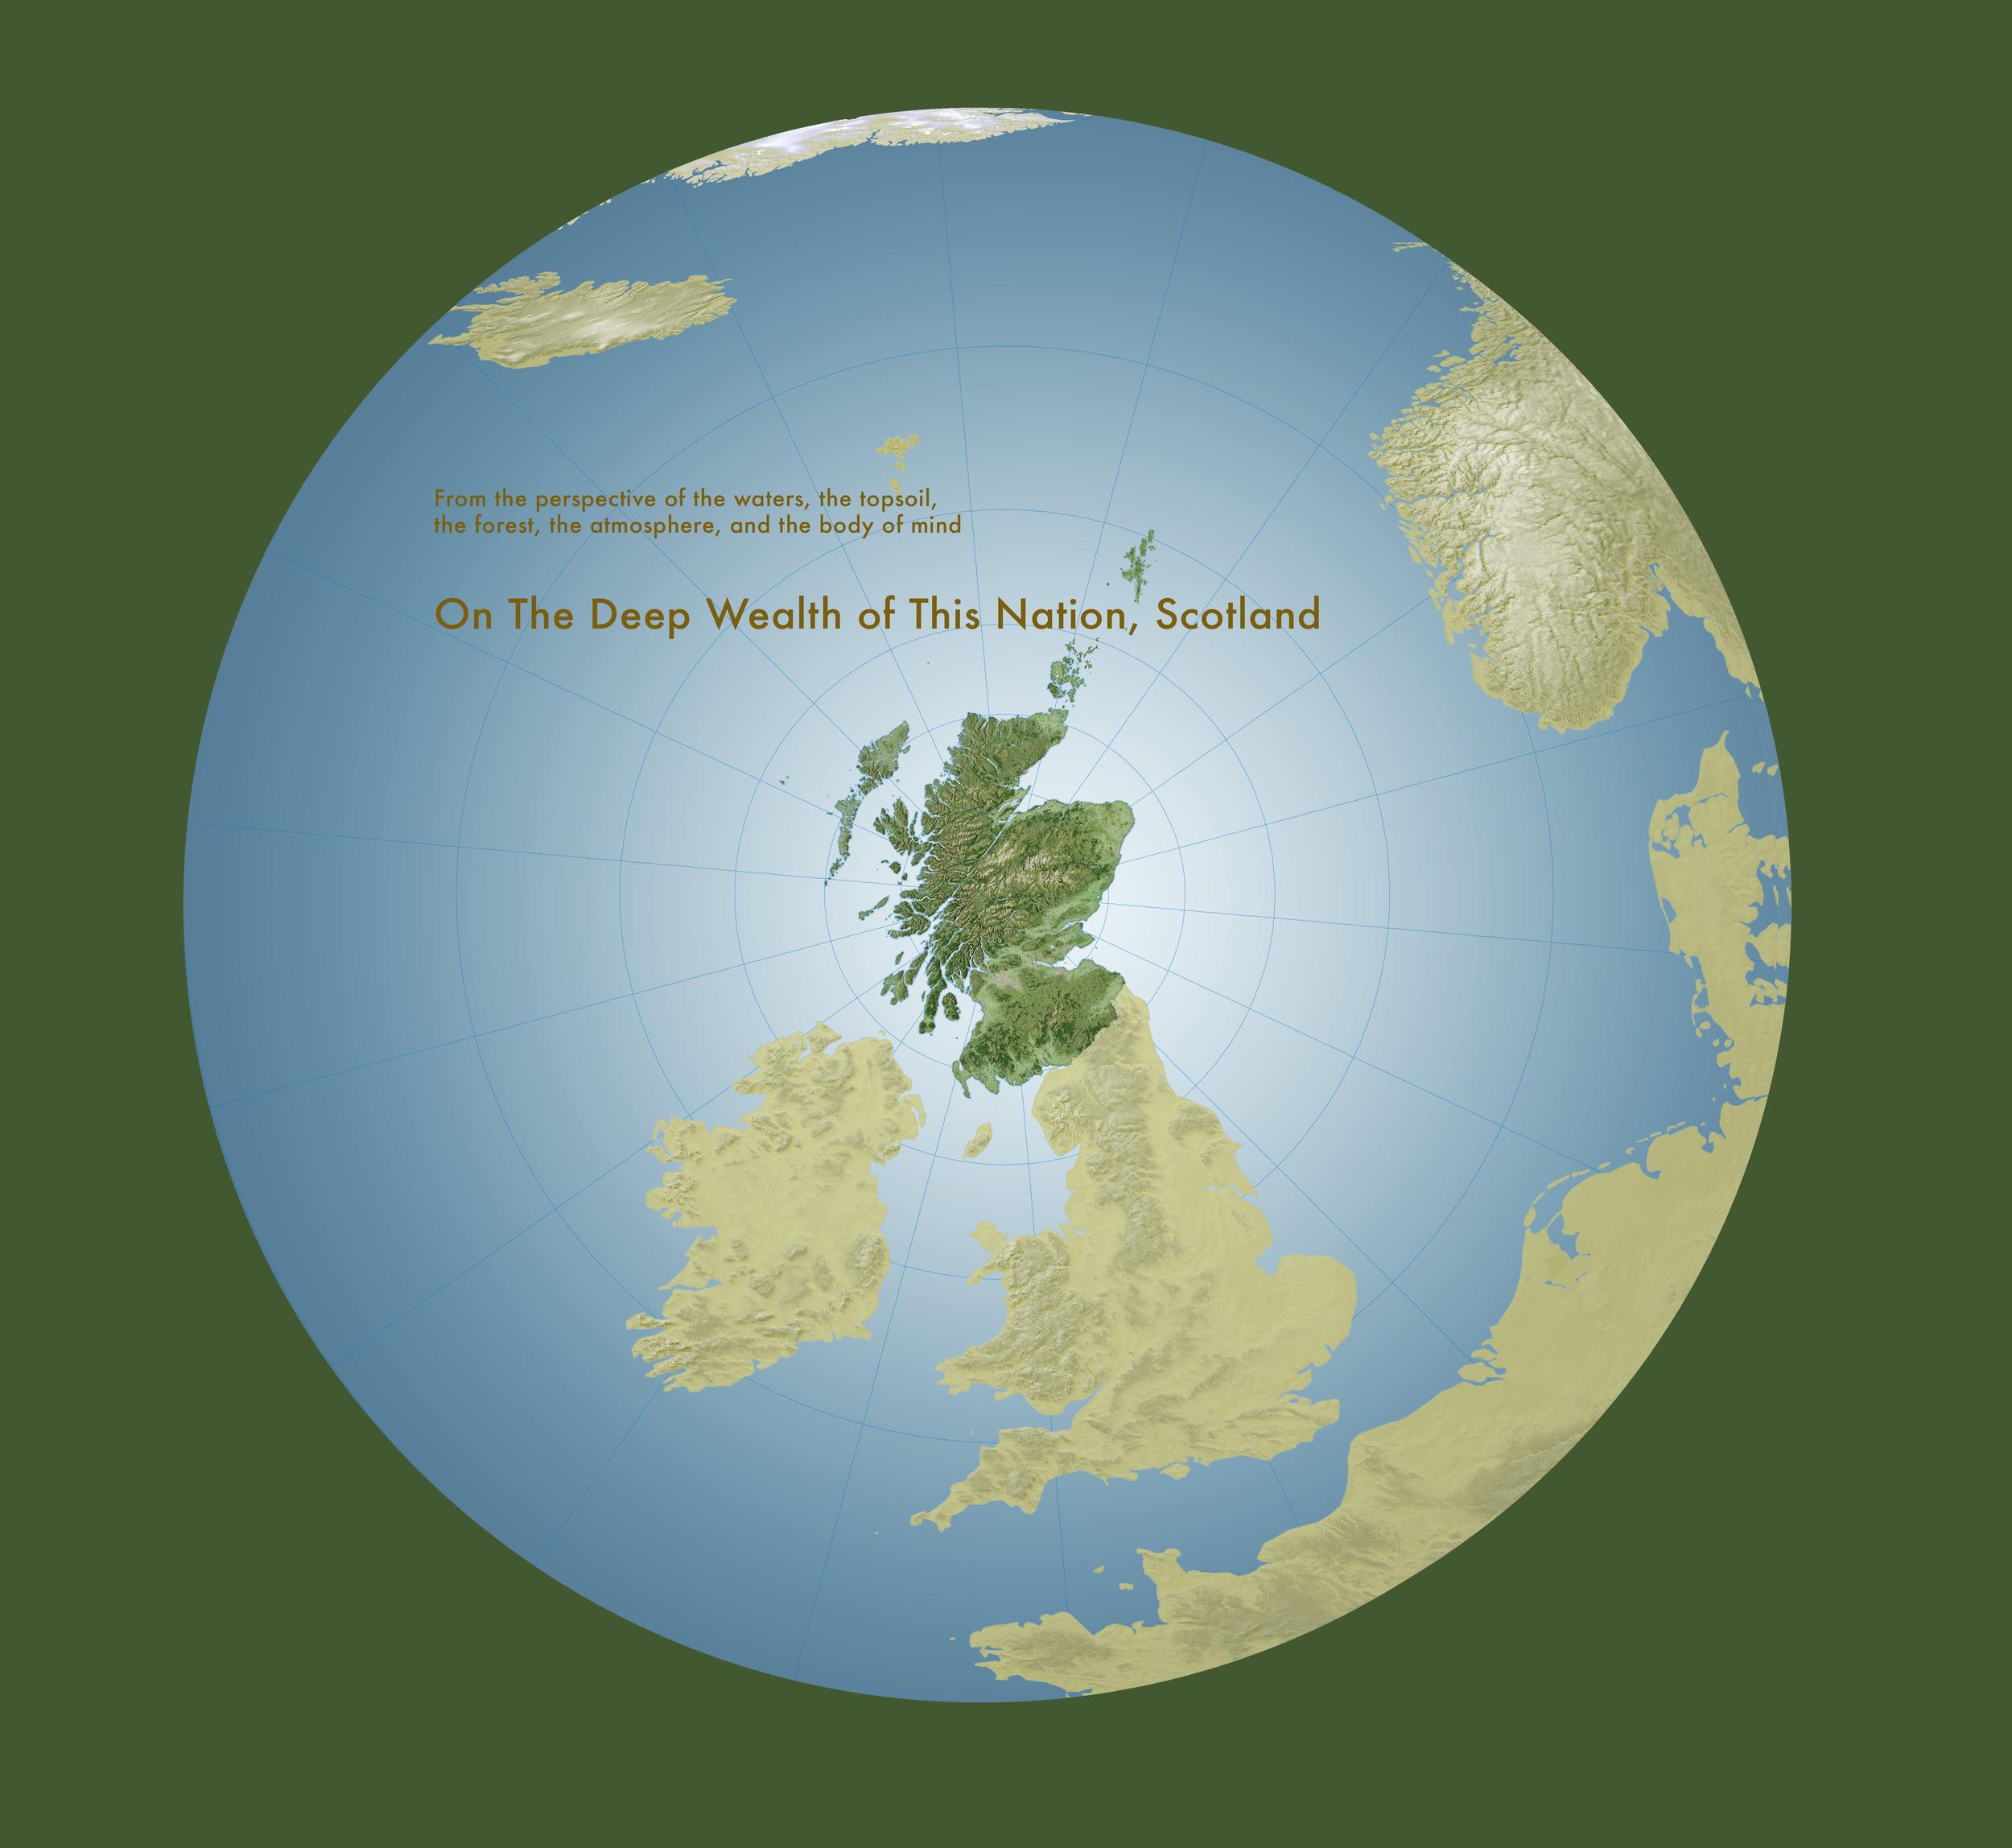 ScotlandRegion.png